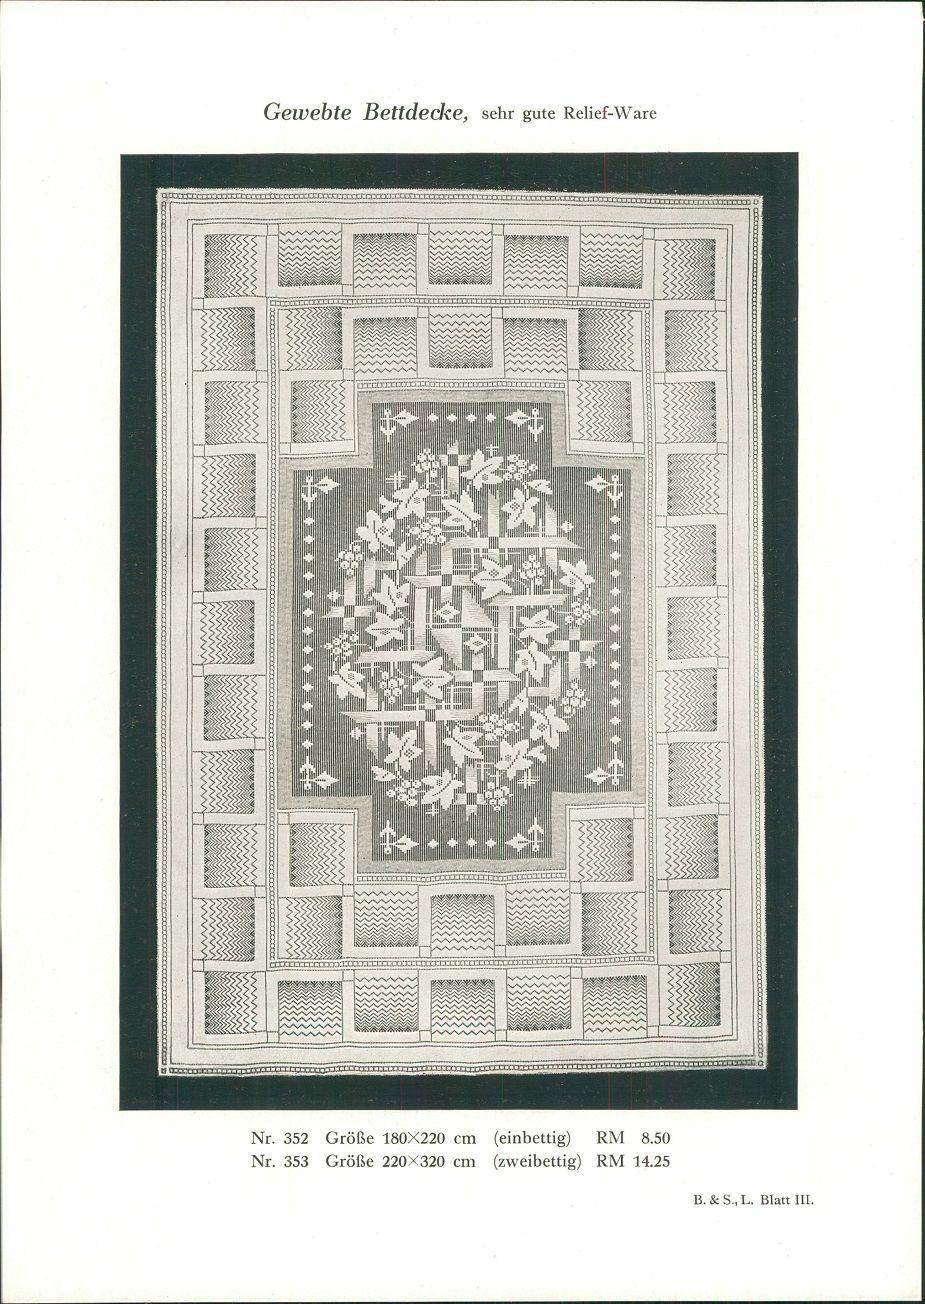 1928 - Druck nach Photographie: Gewebte Bettdecke, sehr gute Reliefware. Nr. 352: 180x220cm (einbettig). RM 8.50. Nr. 353: Größe 220x310 cm (zweibettig) RM 14.25. B. & S. L. Blatt III.